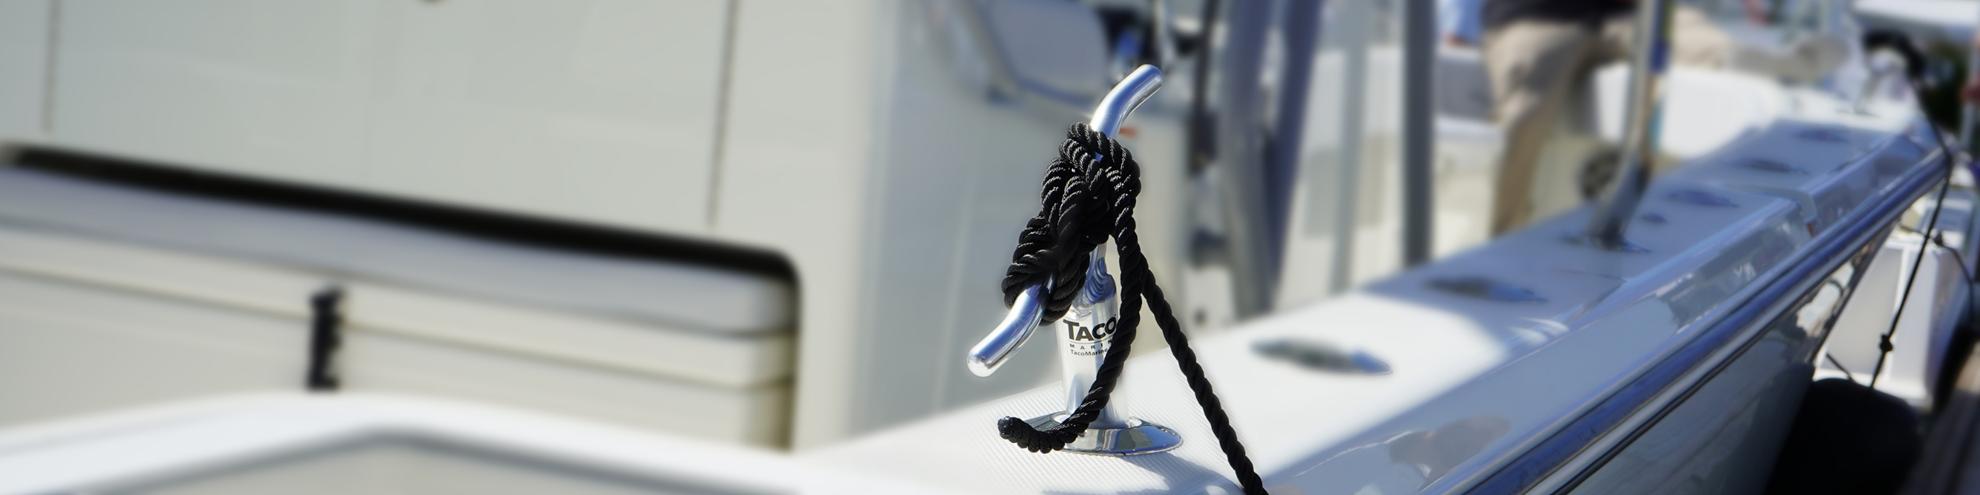 dockside-accessories-f16-0800